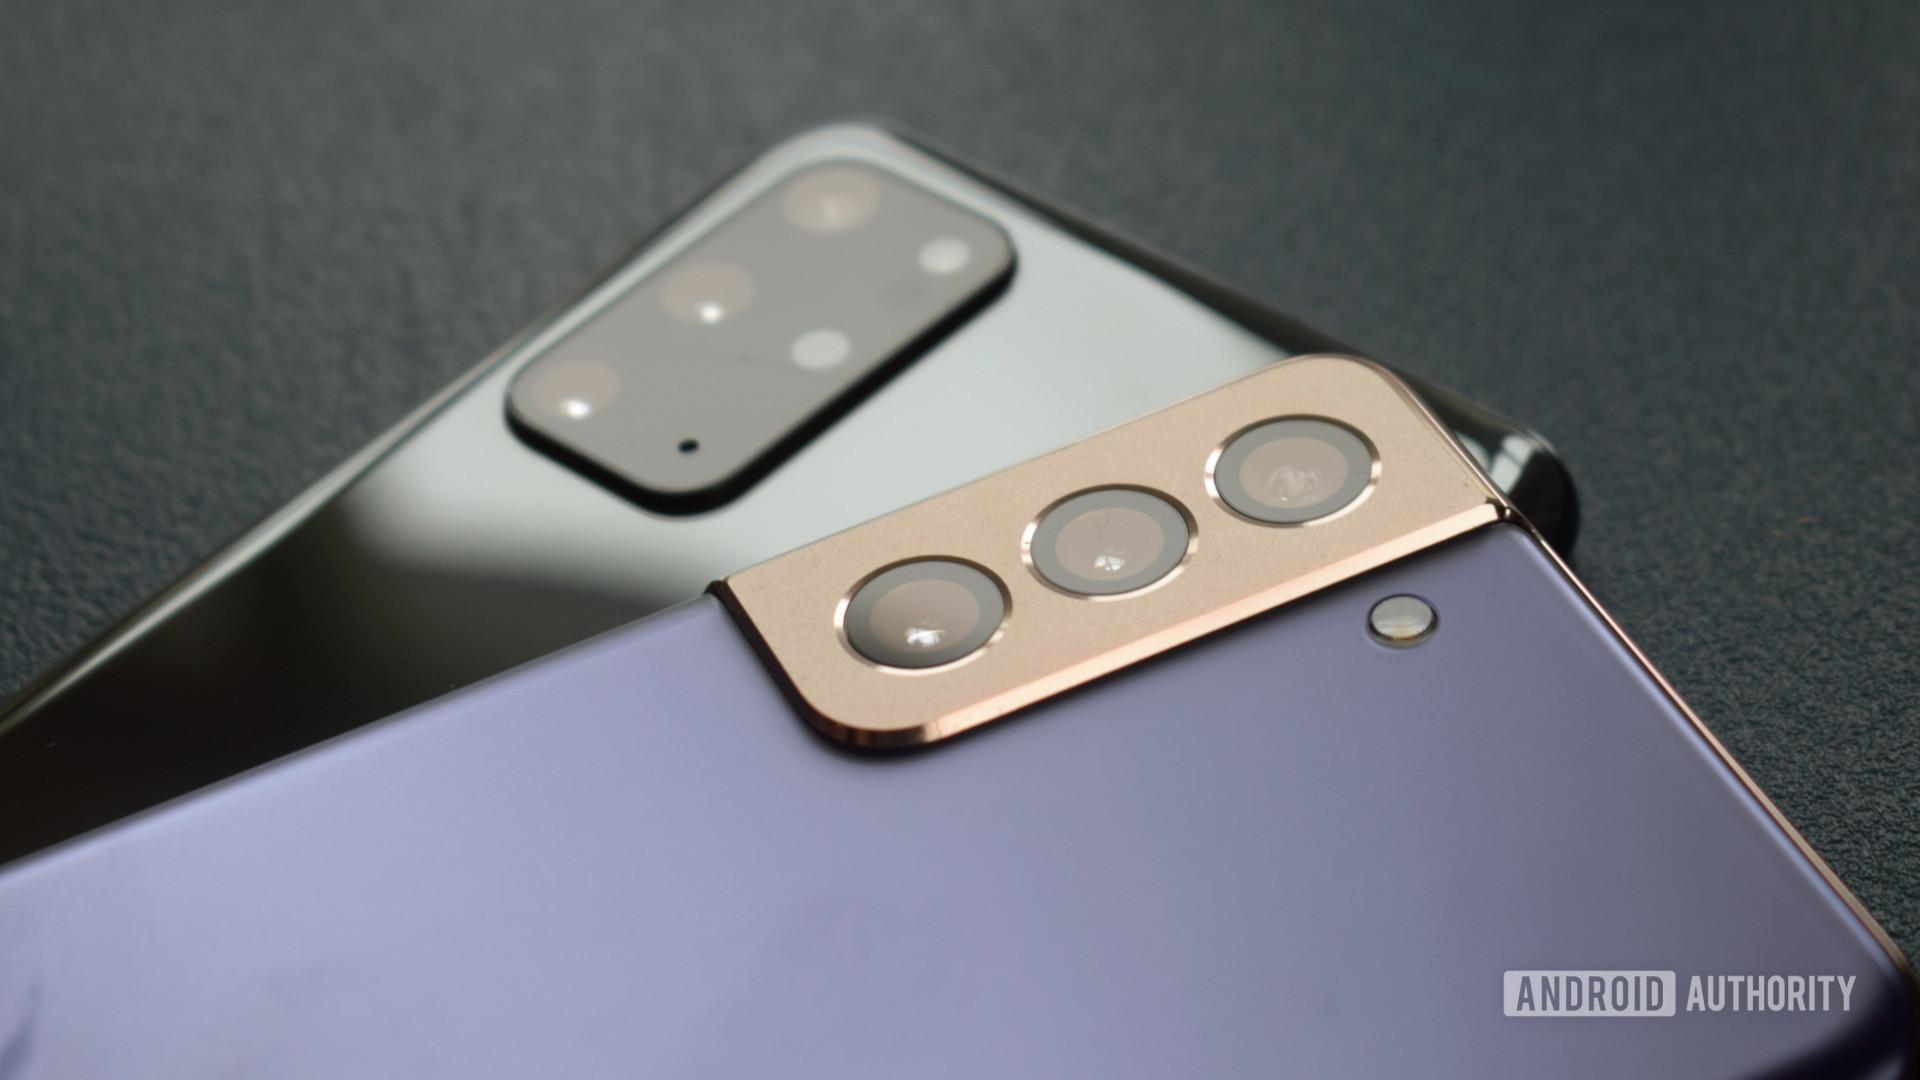 Samsung Galaxy S21 Plus vs Galaxy S20 Plus cameras